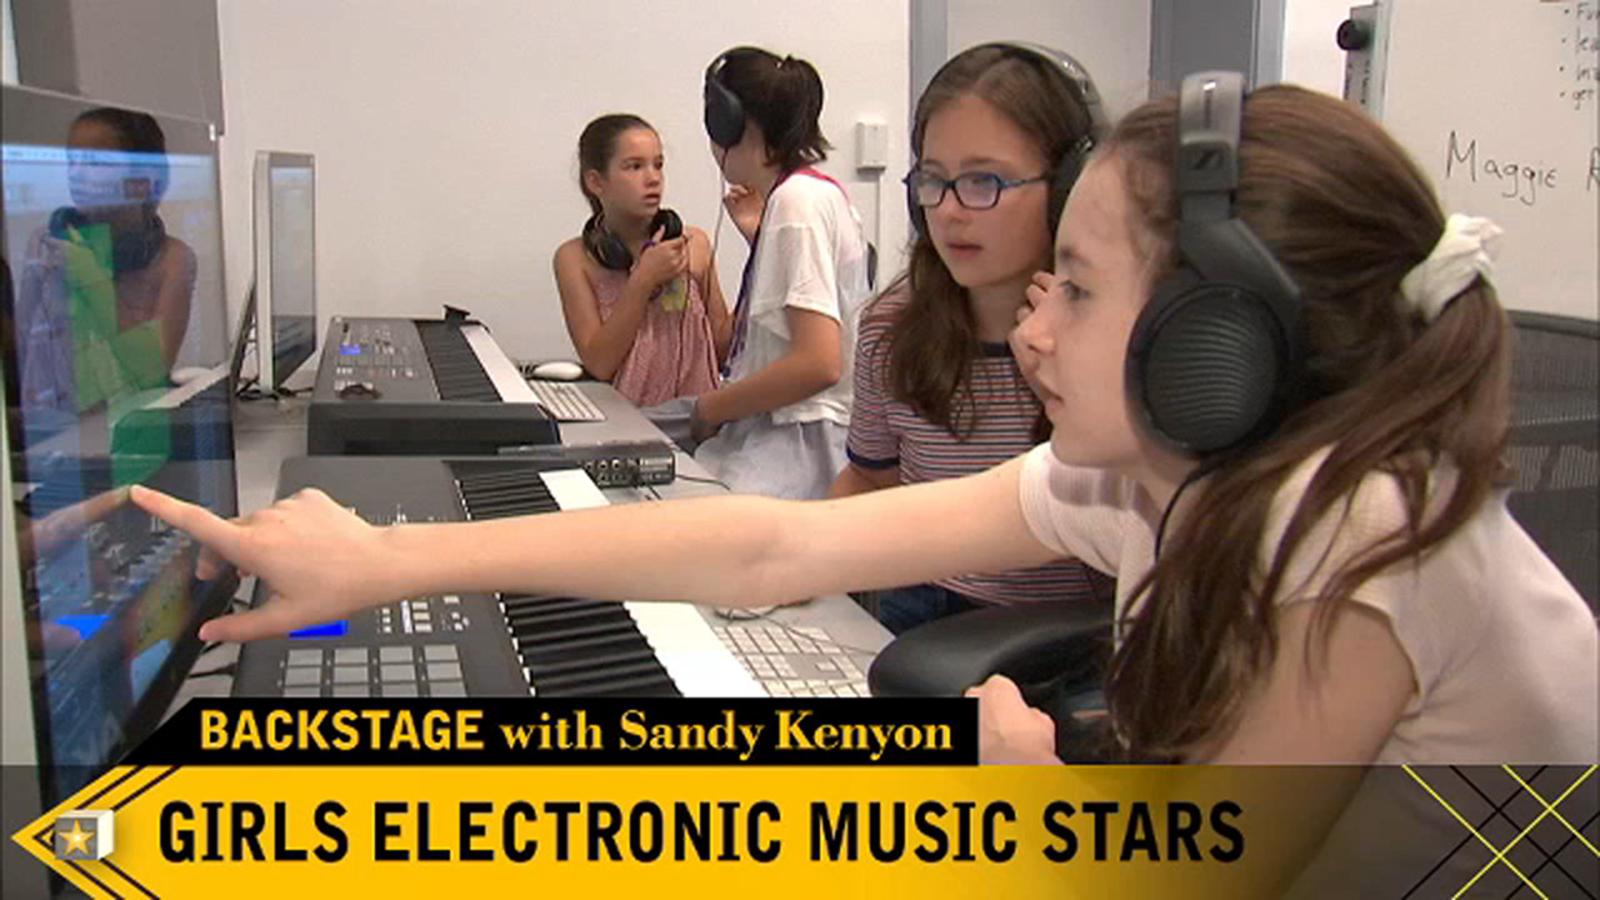 Backstage with Sandy Kenyon: NYU's GEMS program